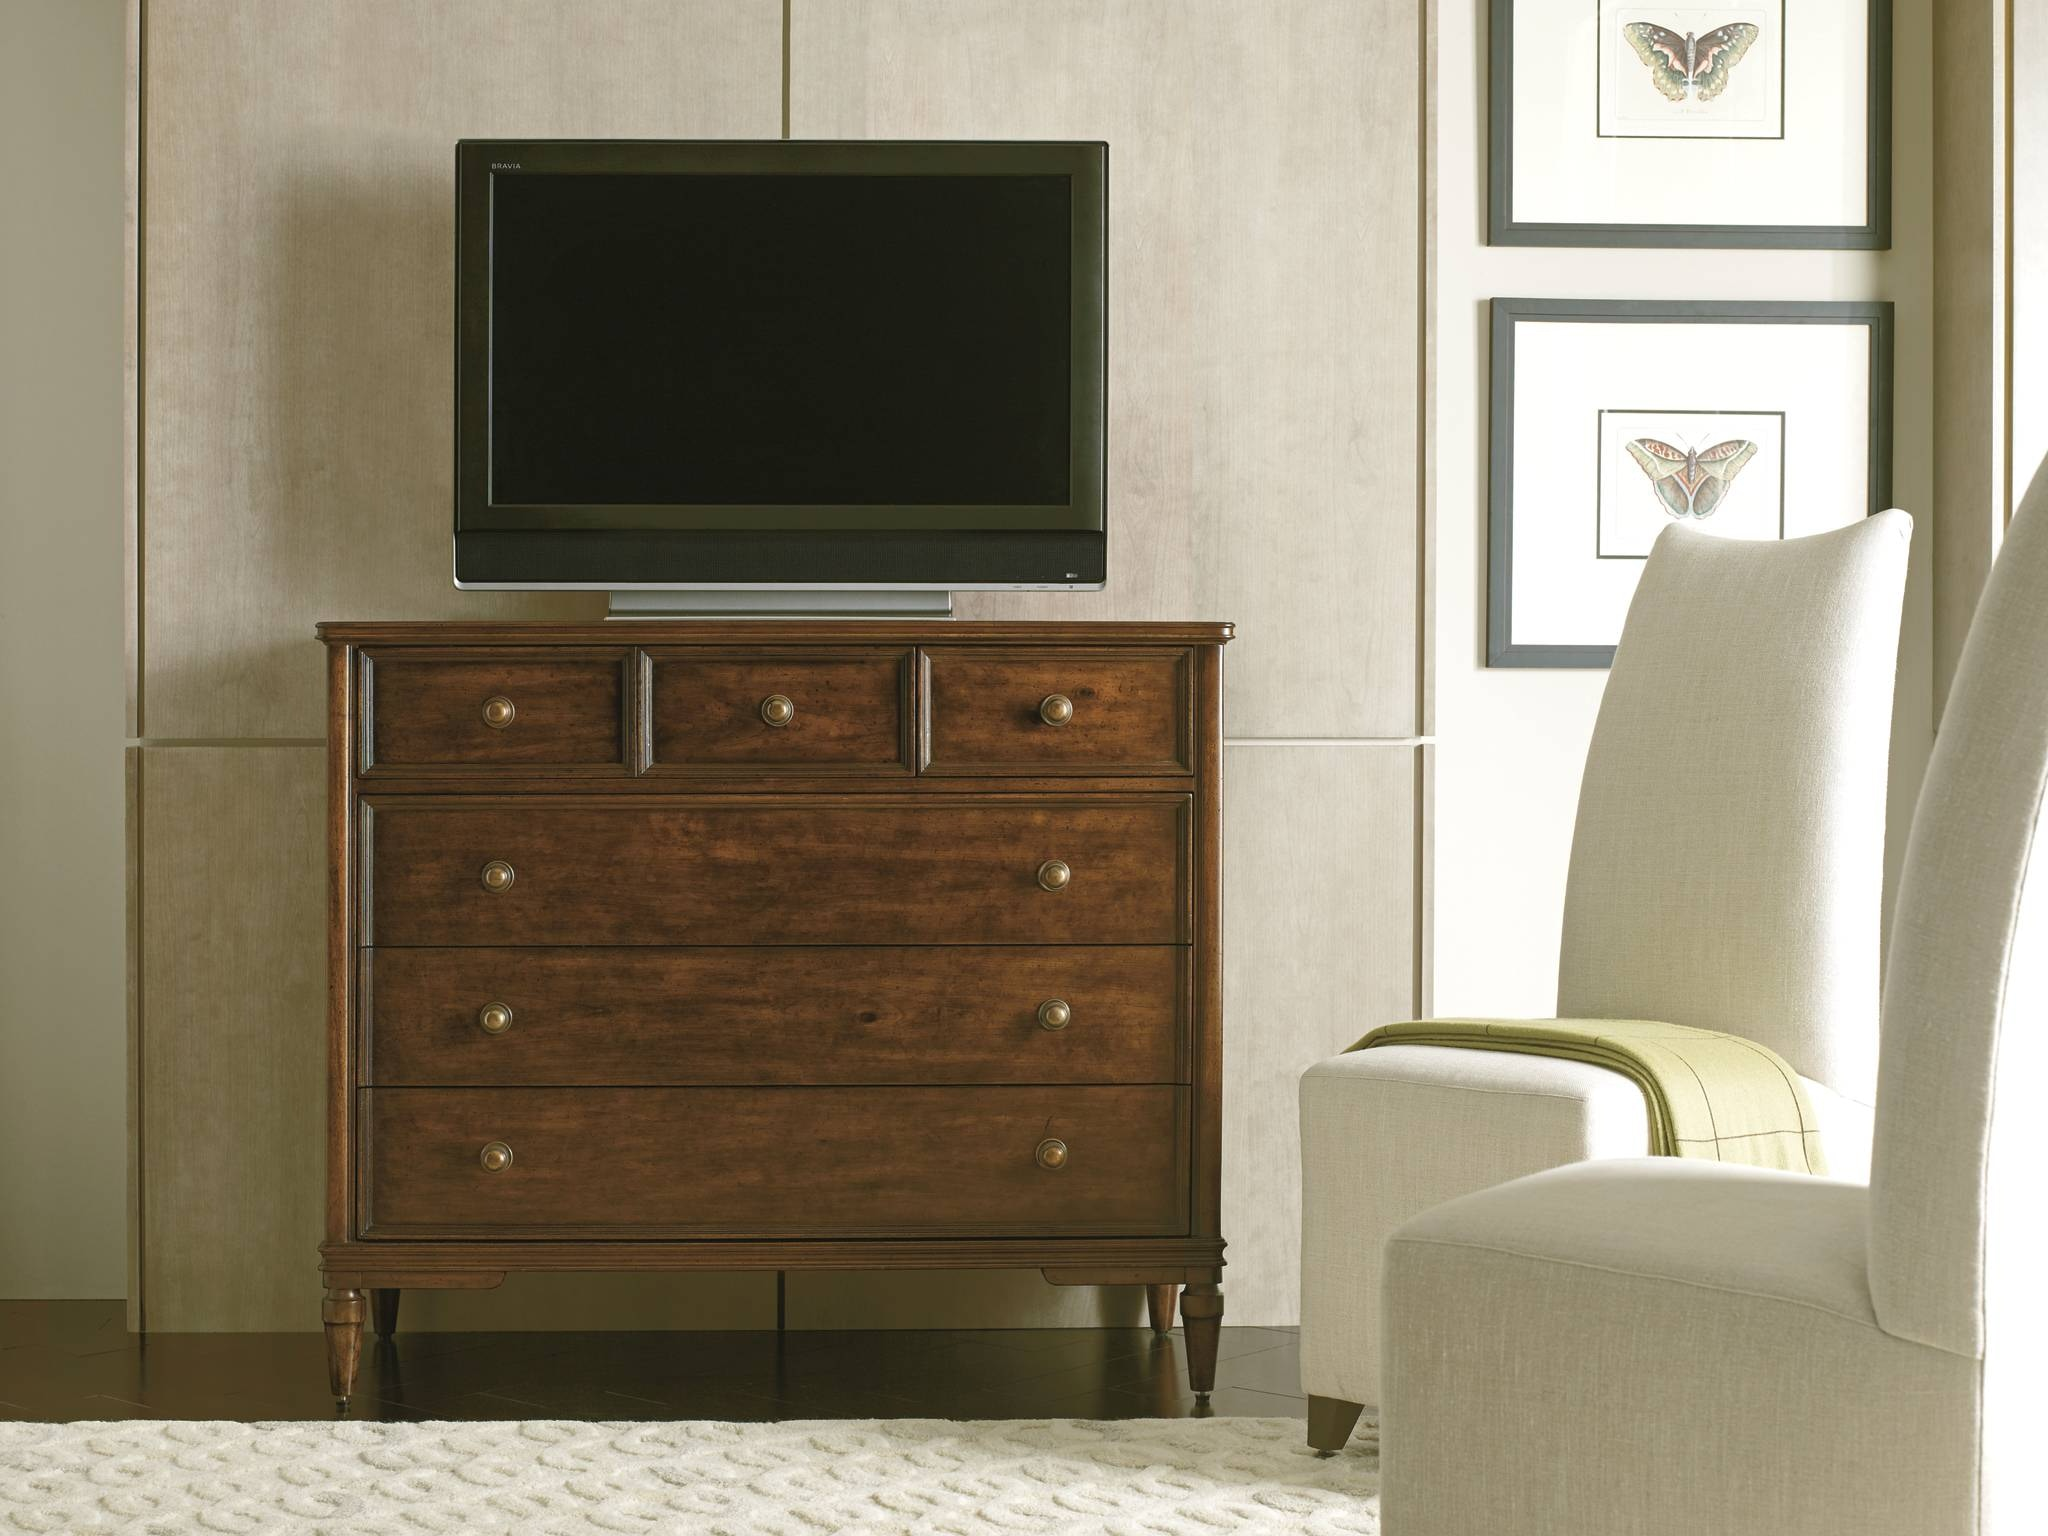 stanley furniture bedroom media chest 264 13 11 norwood furniture stanley furniture media chest 264 13 11